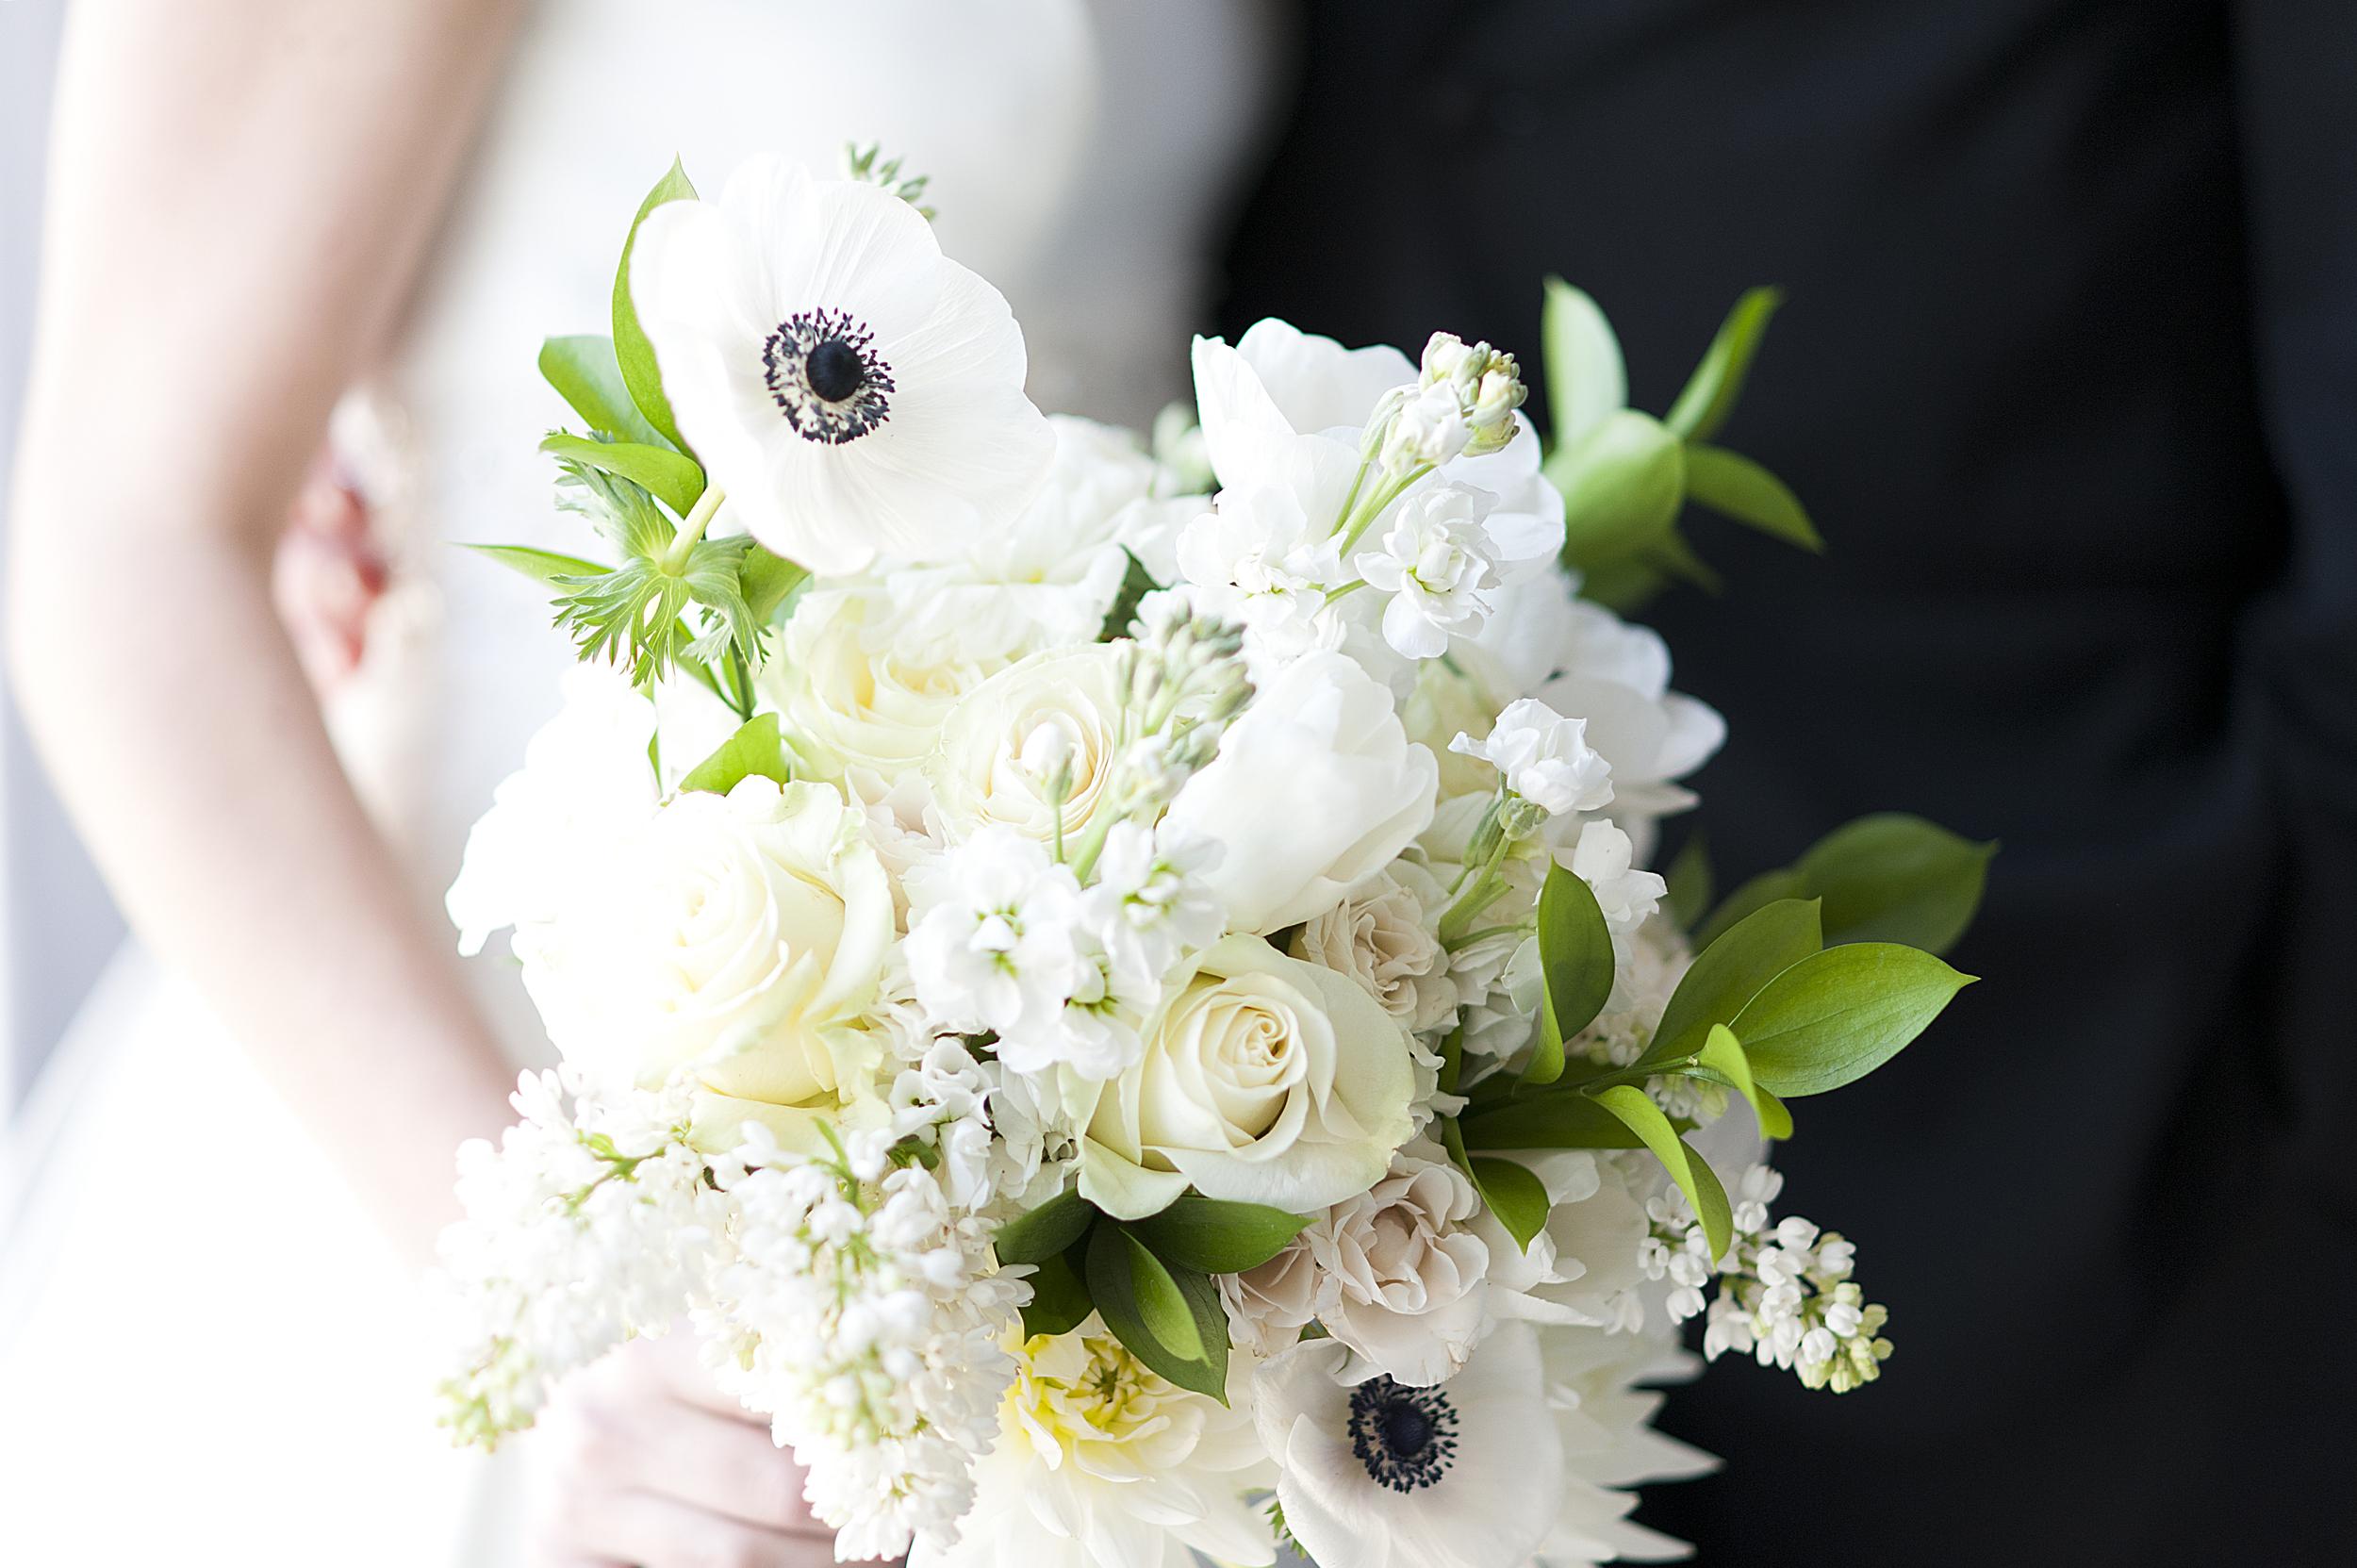 White bridal bouquet - eversomething.com